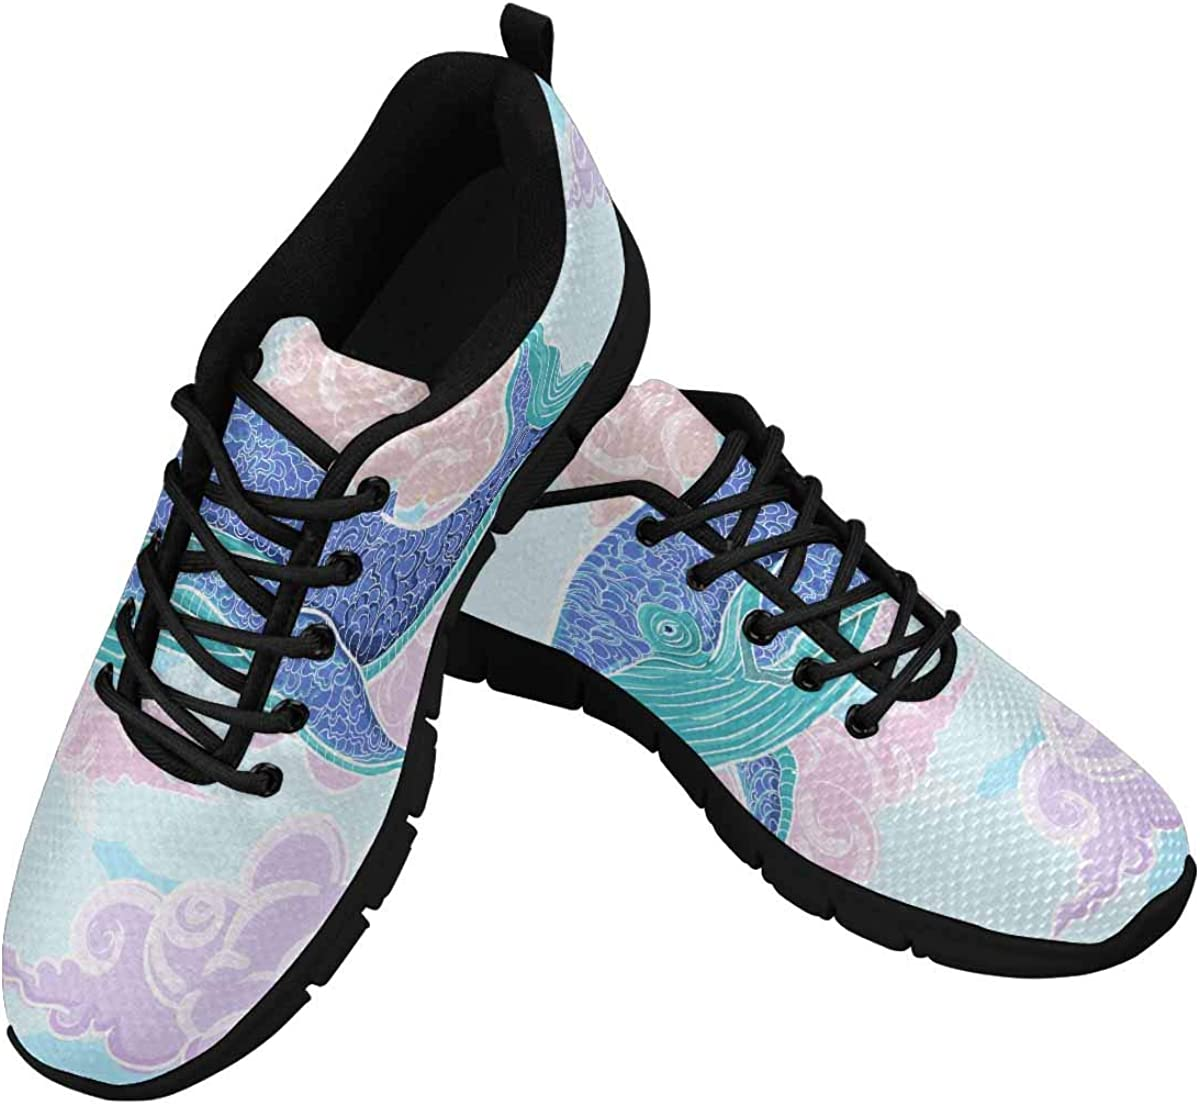 INTERESTPRINT Ocean Whale Women's Walking Shoes Lightweight Casual Running Sneakers